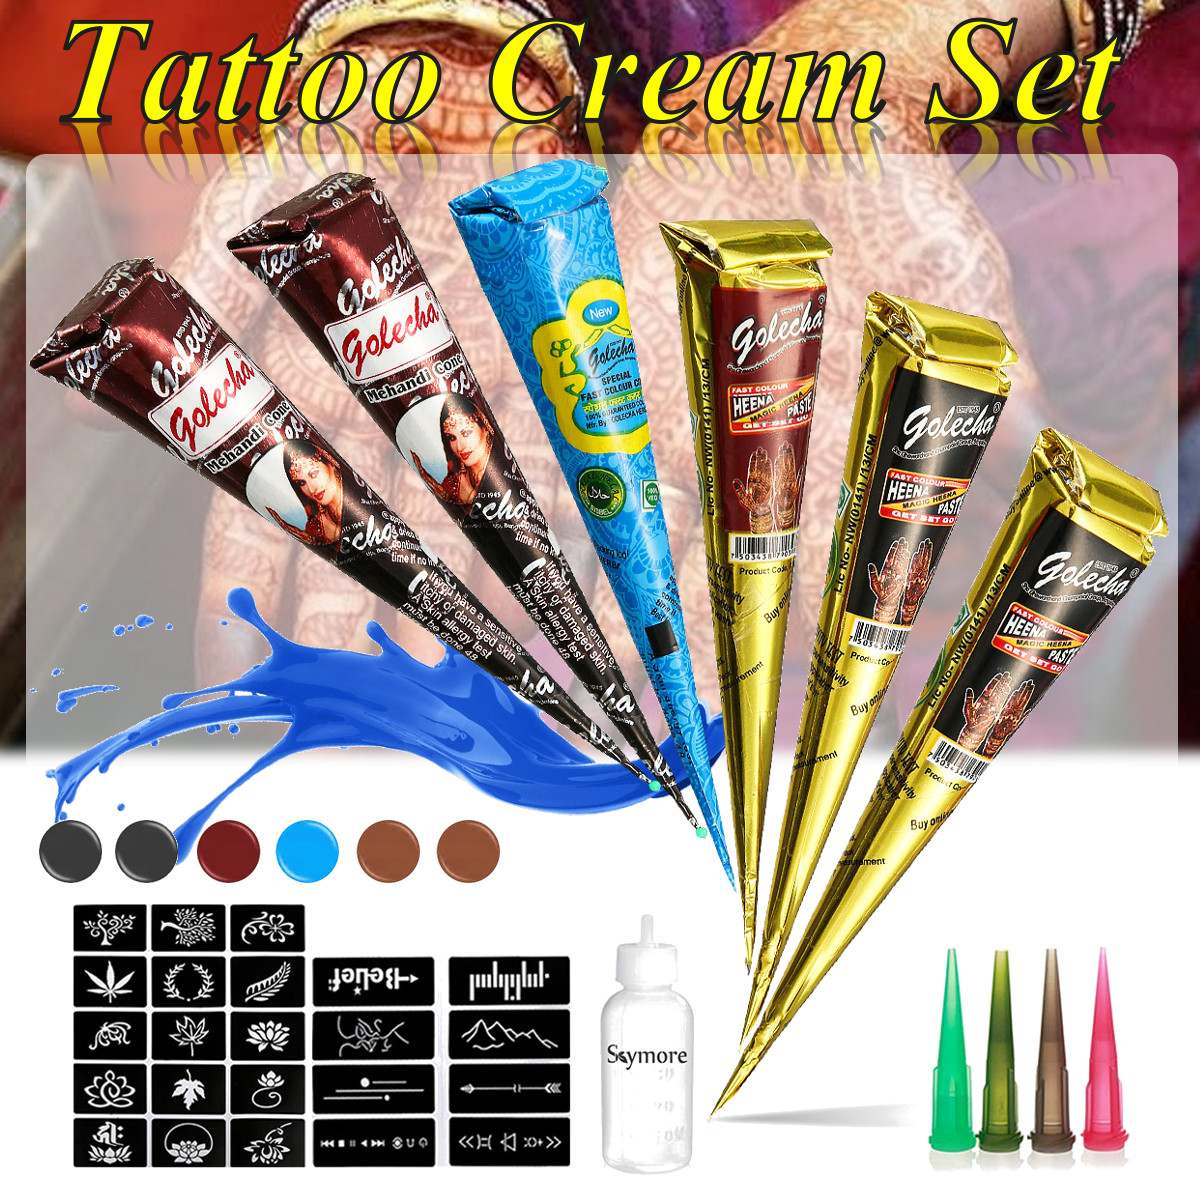 Henna Body Art Set, Tattoo Paste Cones 6pcs + Henna Applicator + Stencil, Sexy Temporary Tatoo Wedding Adult Sex Products